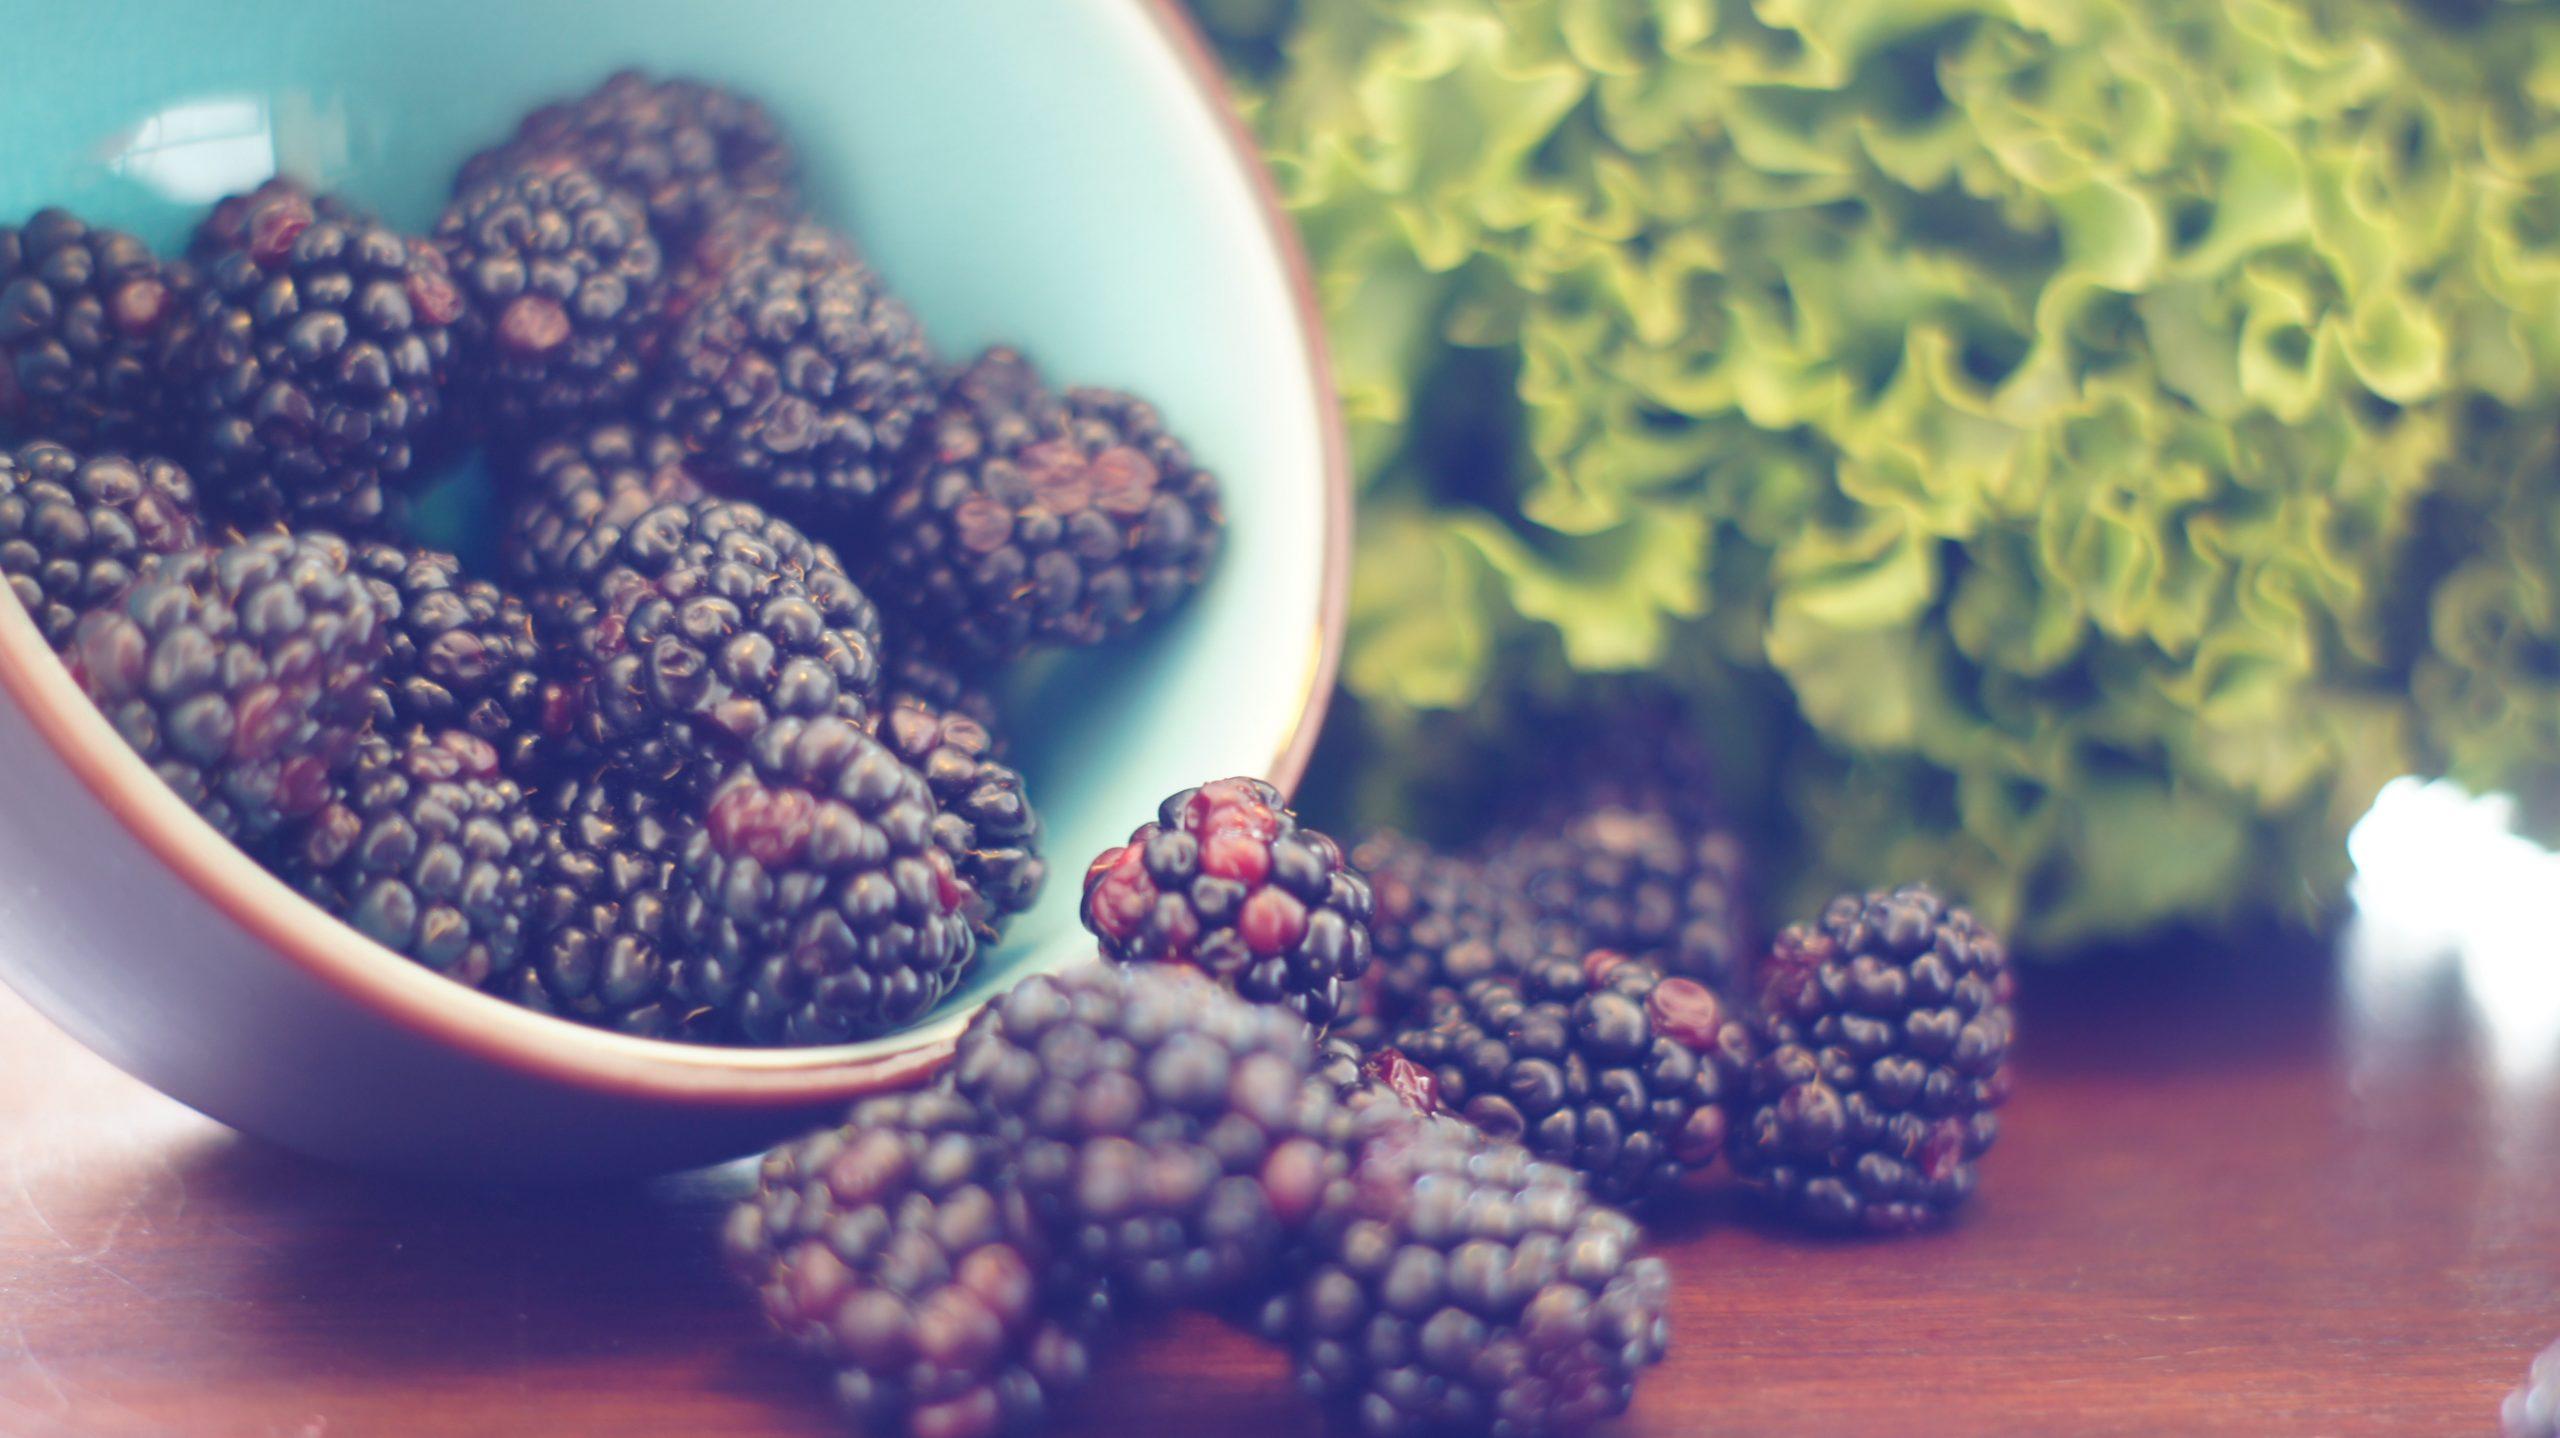 7 Benefits Of Eating Blackberries